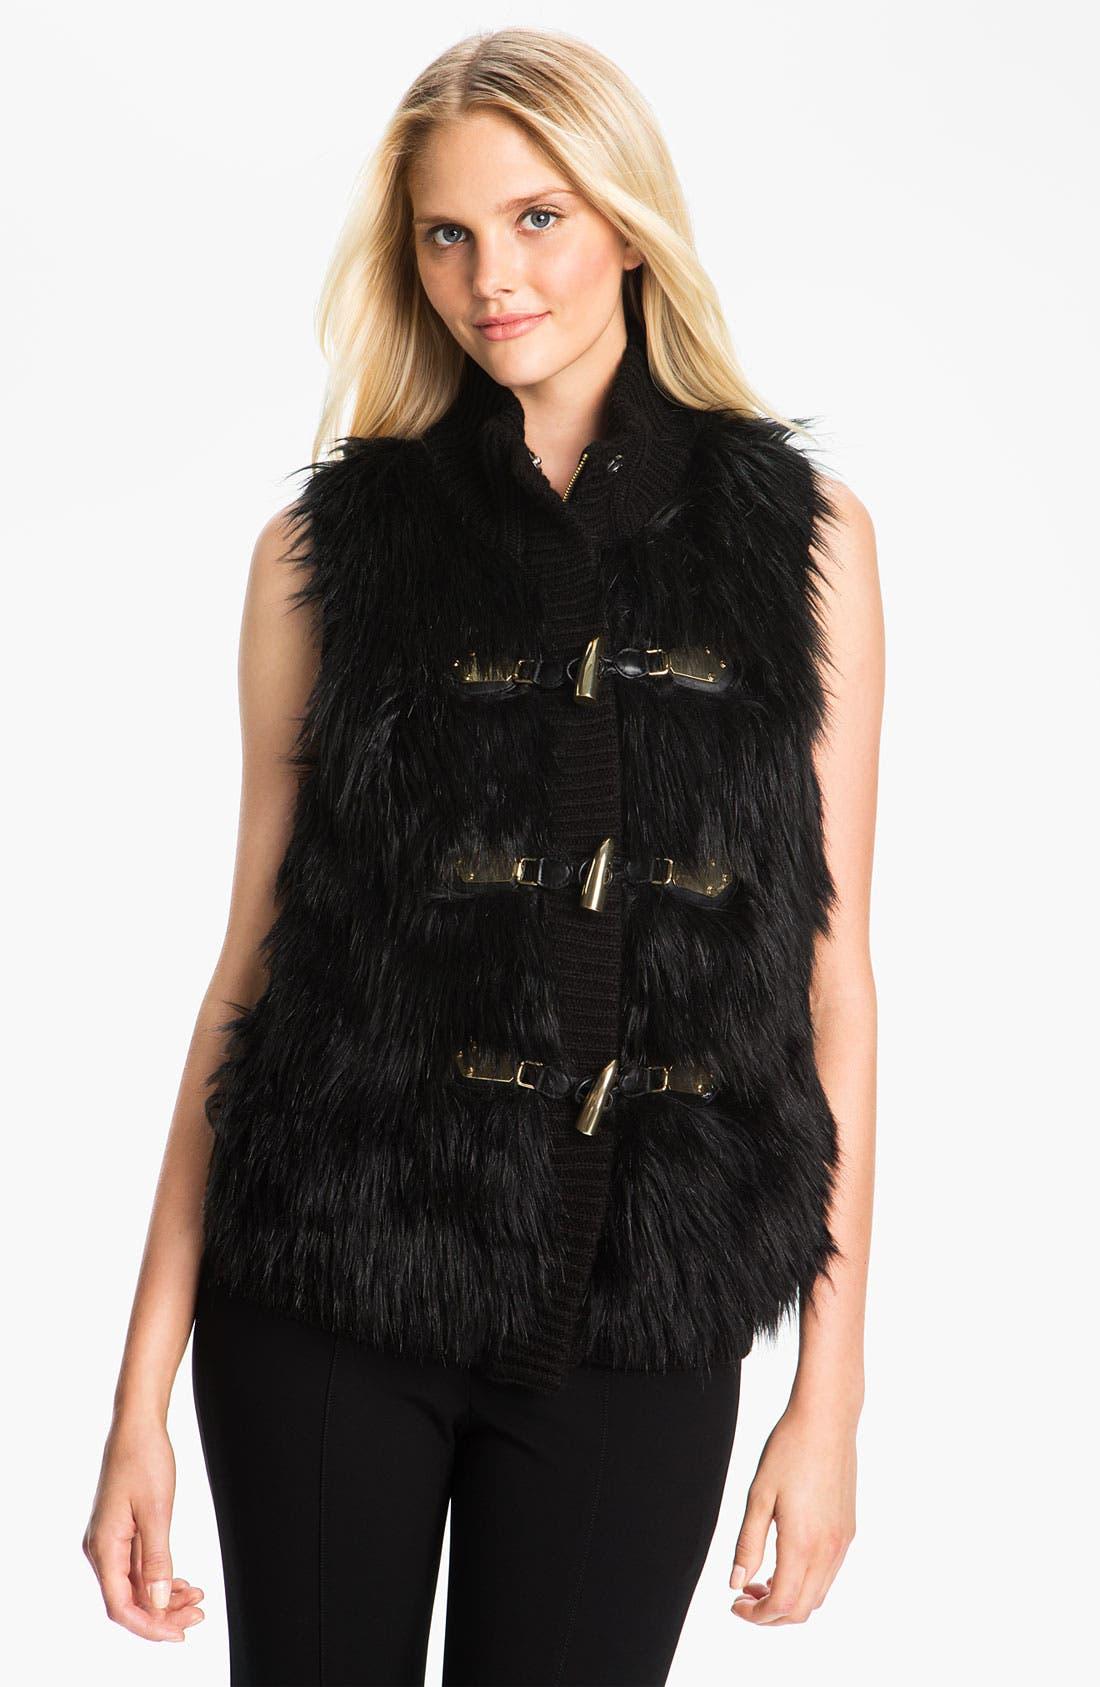 Alternate Image 1 Selected - MICHAEL Michael Kors Faux Fur Front Sweater Vest